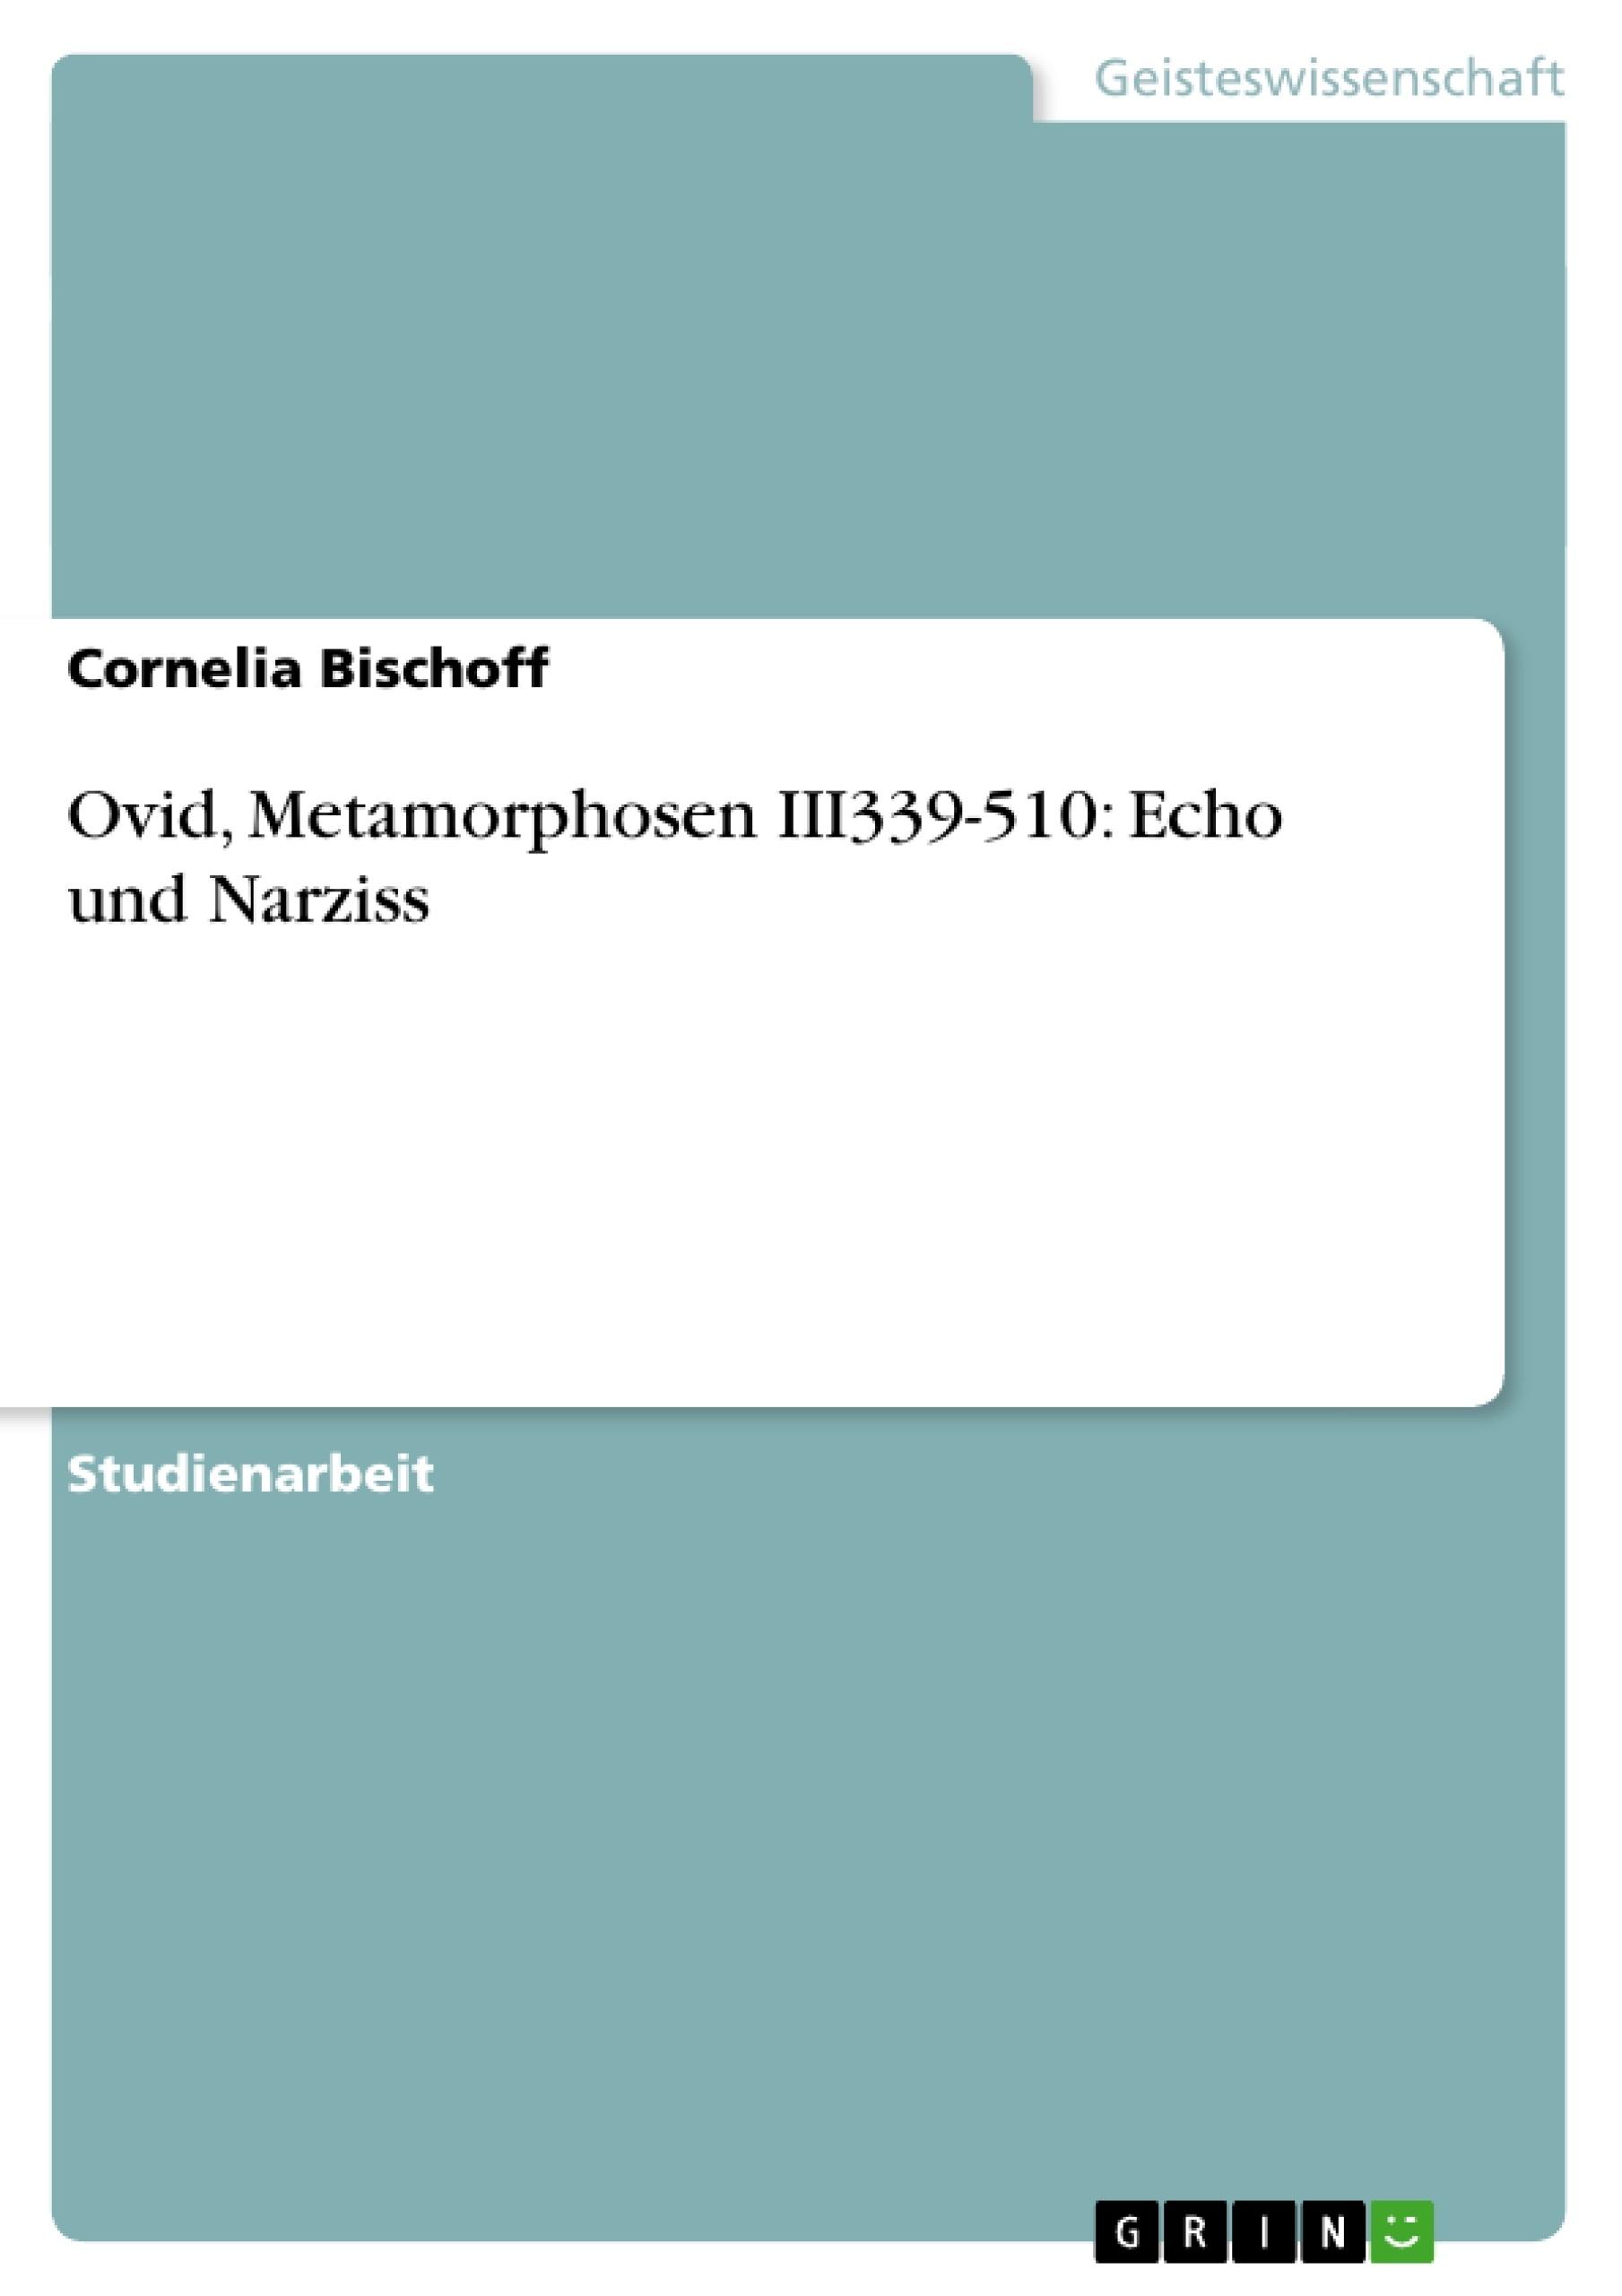 Titel: Ovid, Metamorphosen III339-510: Echo und Narziss